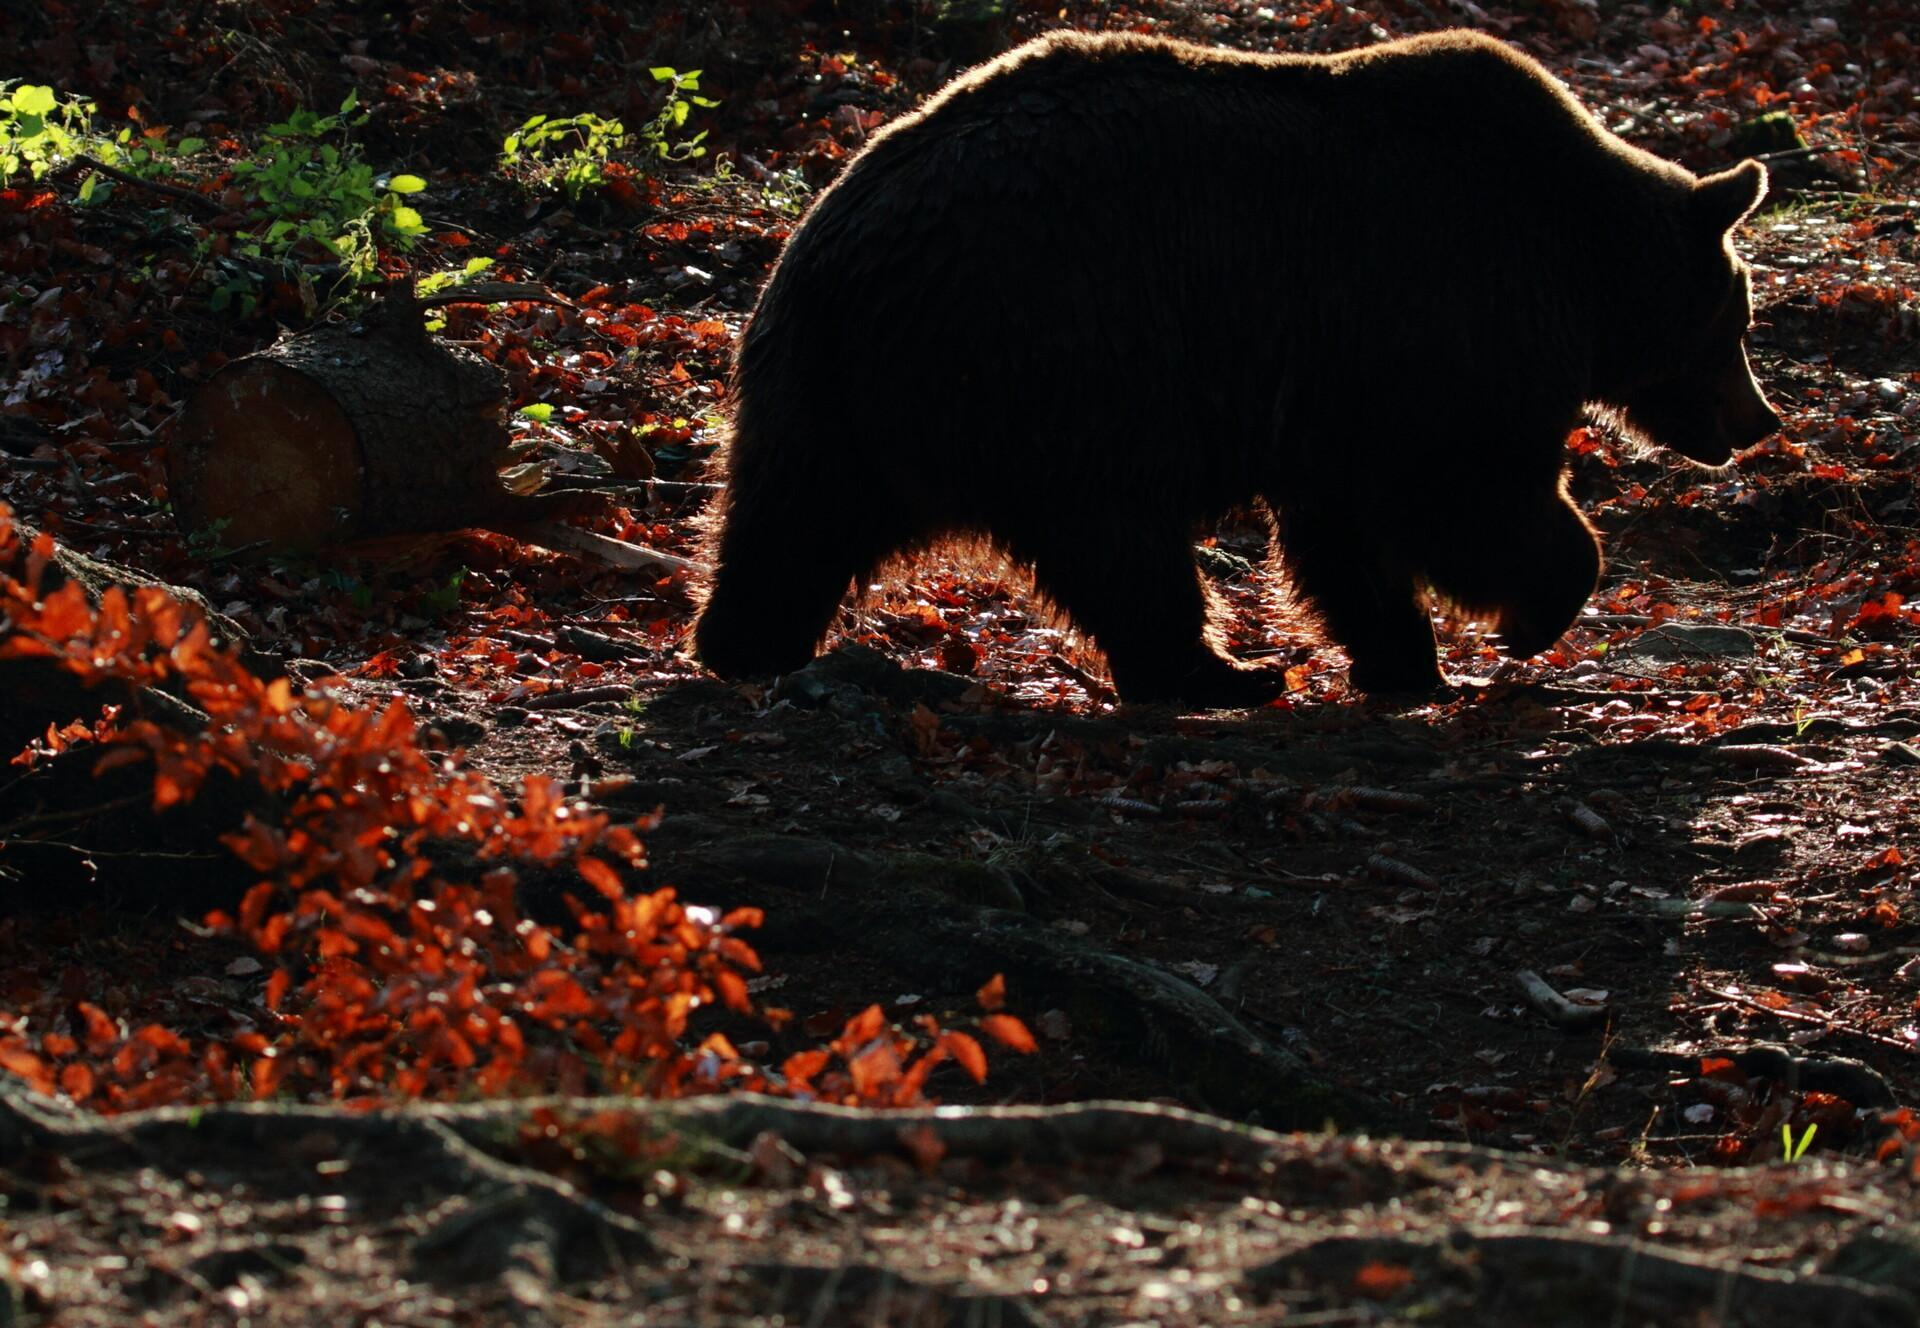 Bear at BEAR SANCTUARY Arbesbach